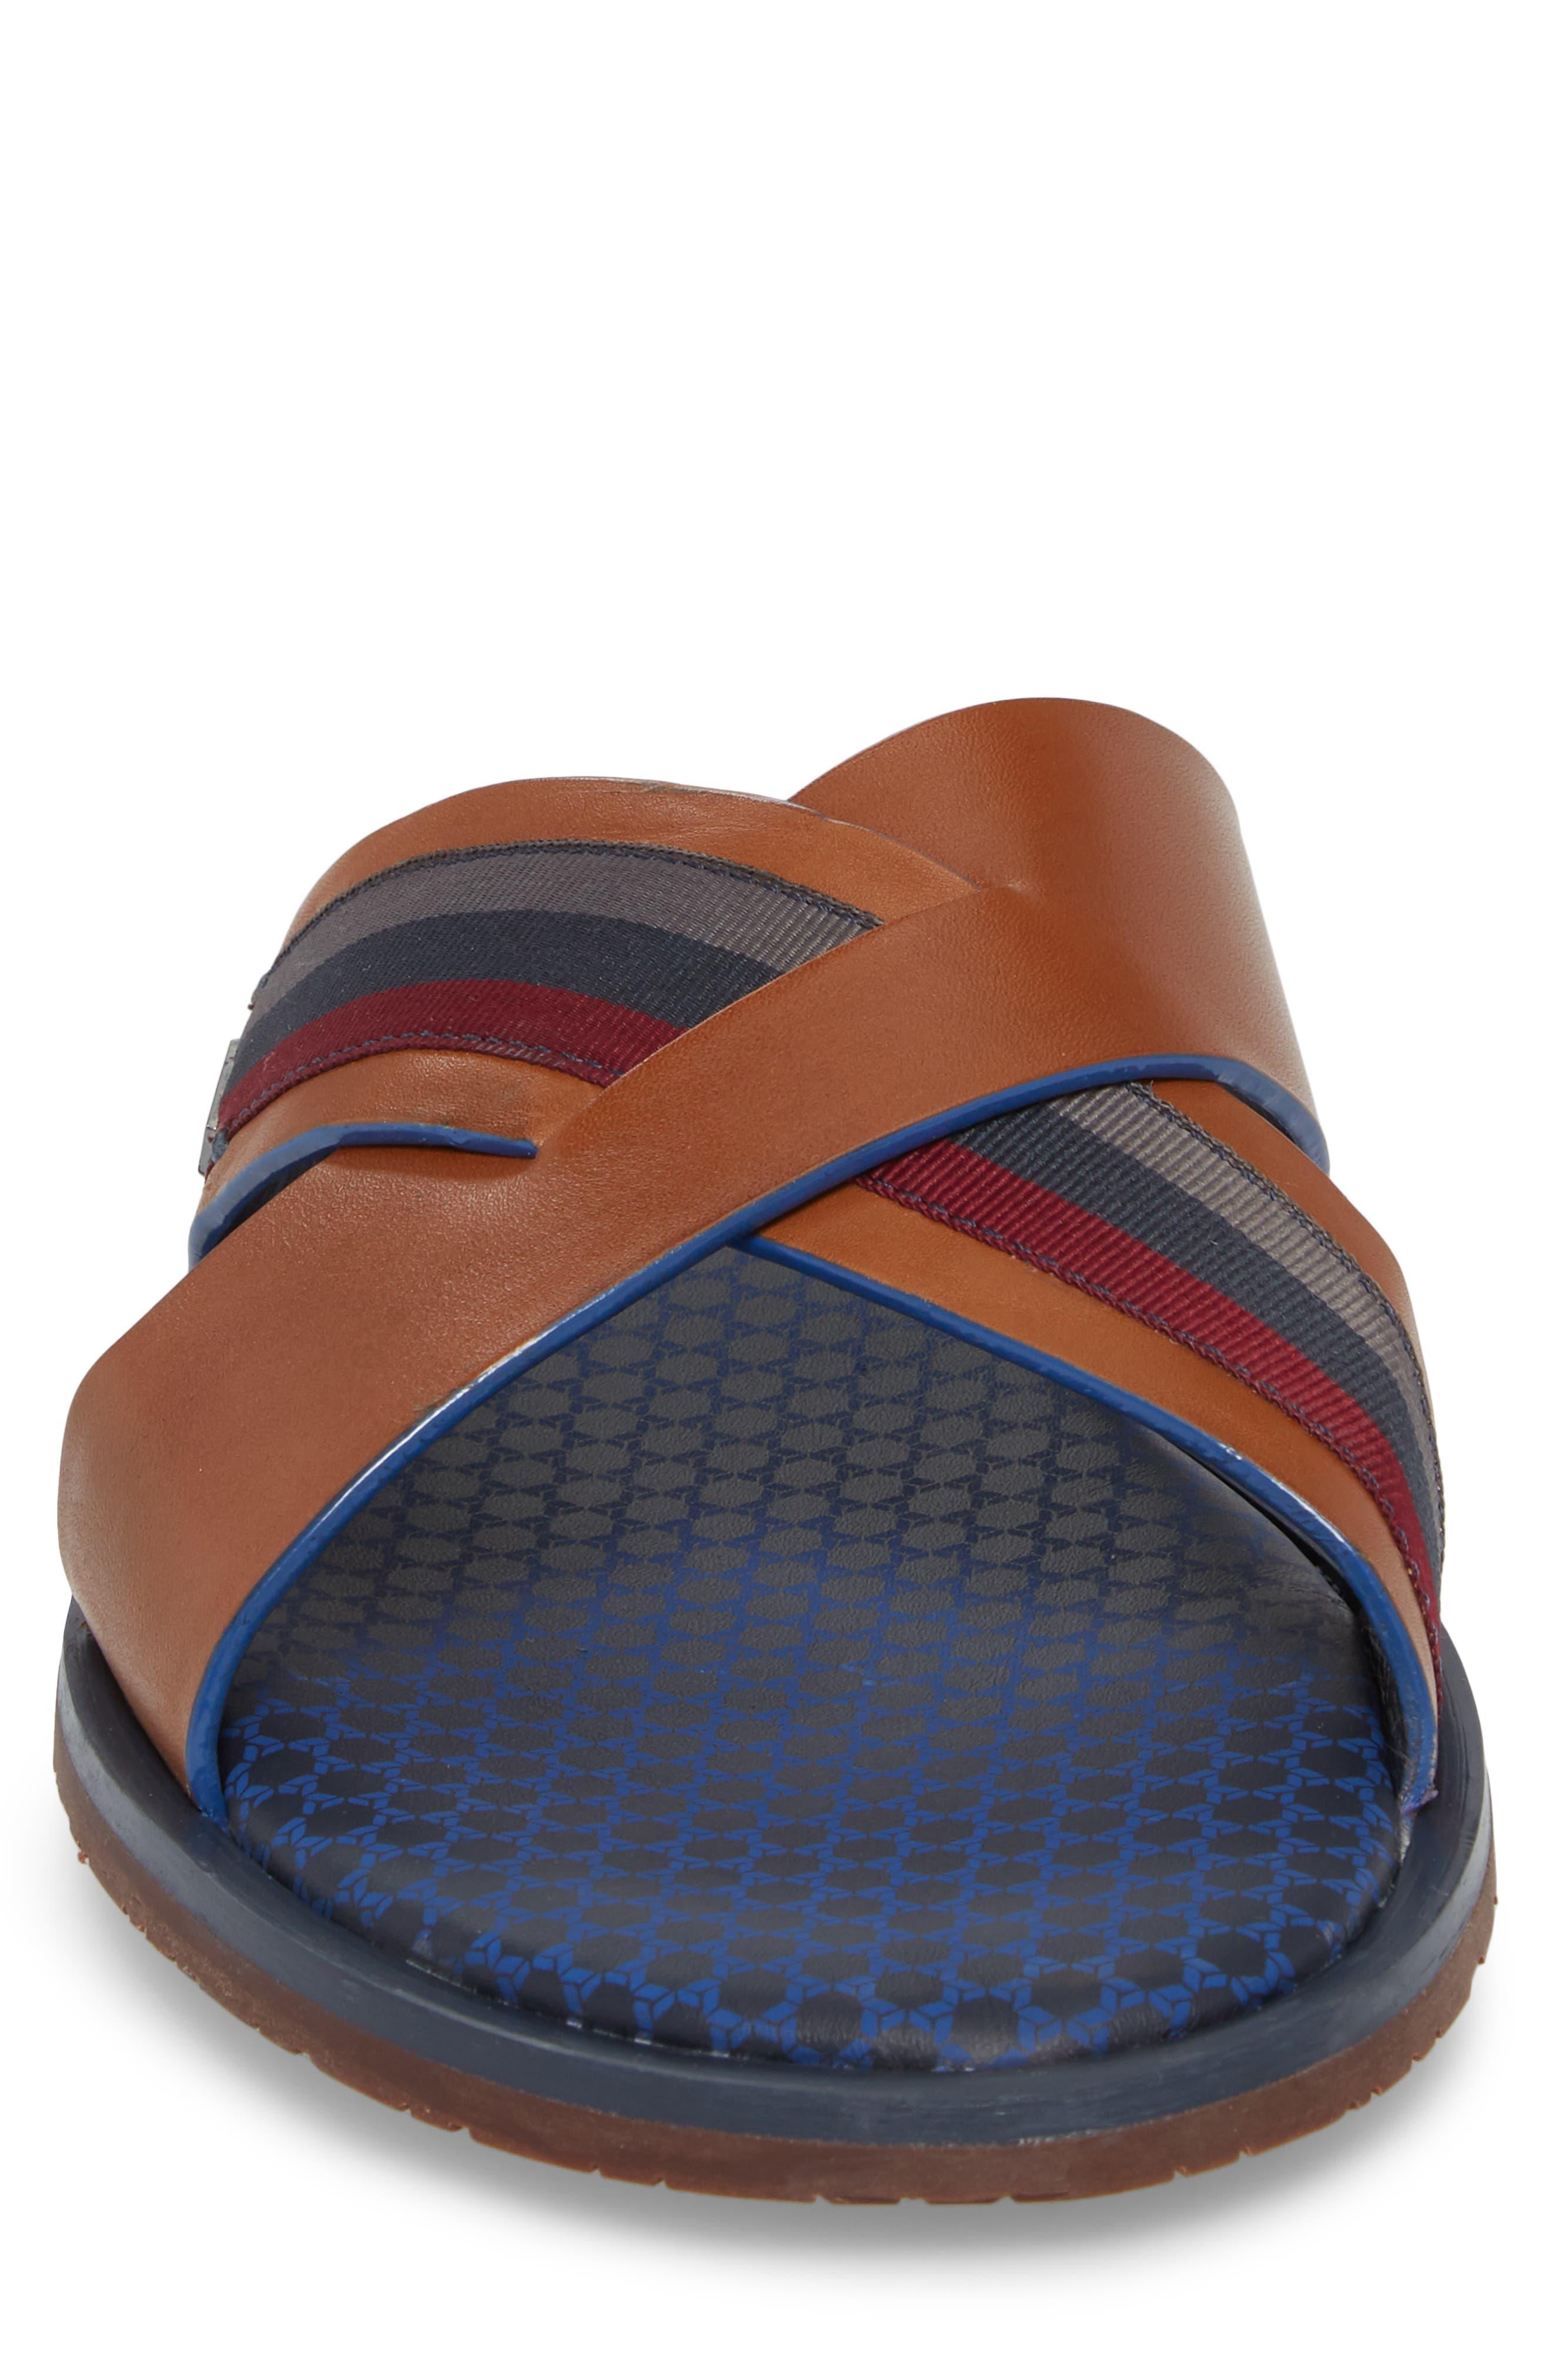 Farrull Cross Strap Slide Sandal,                             Alternate thumbnail 4, color,                             Tan Leather/ Textile